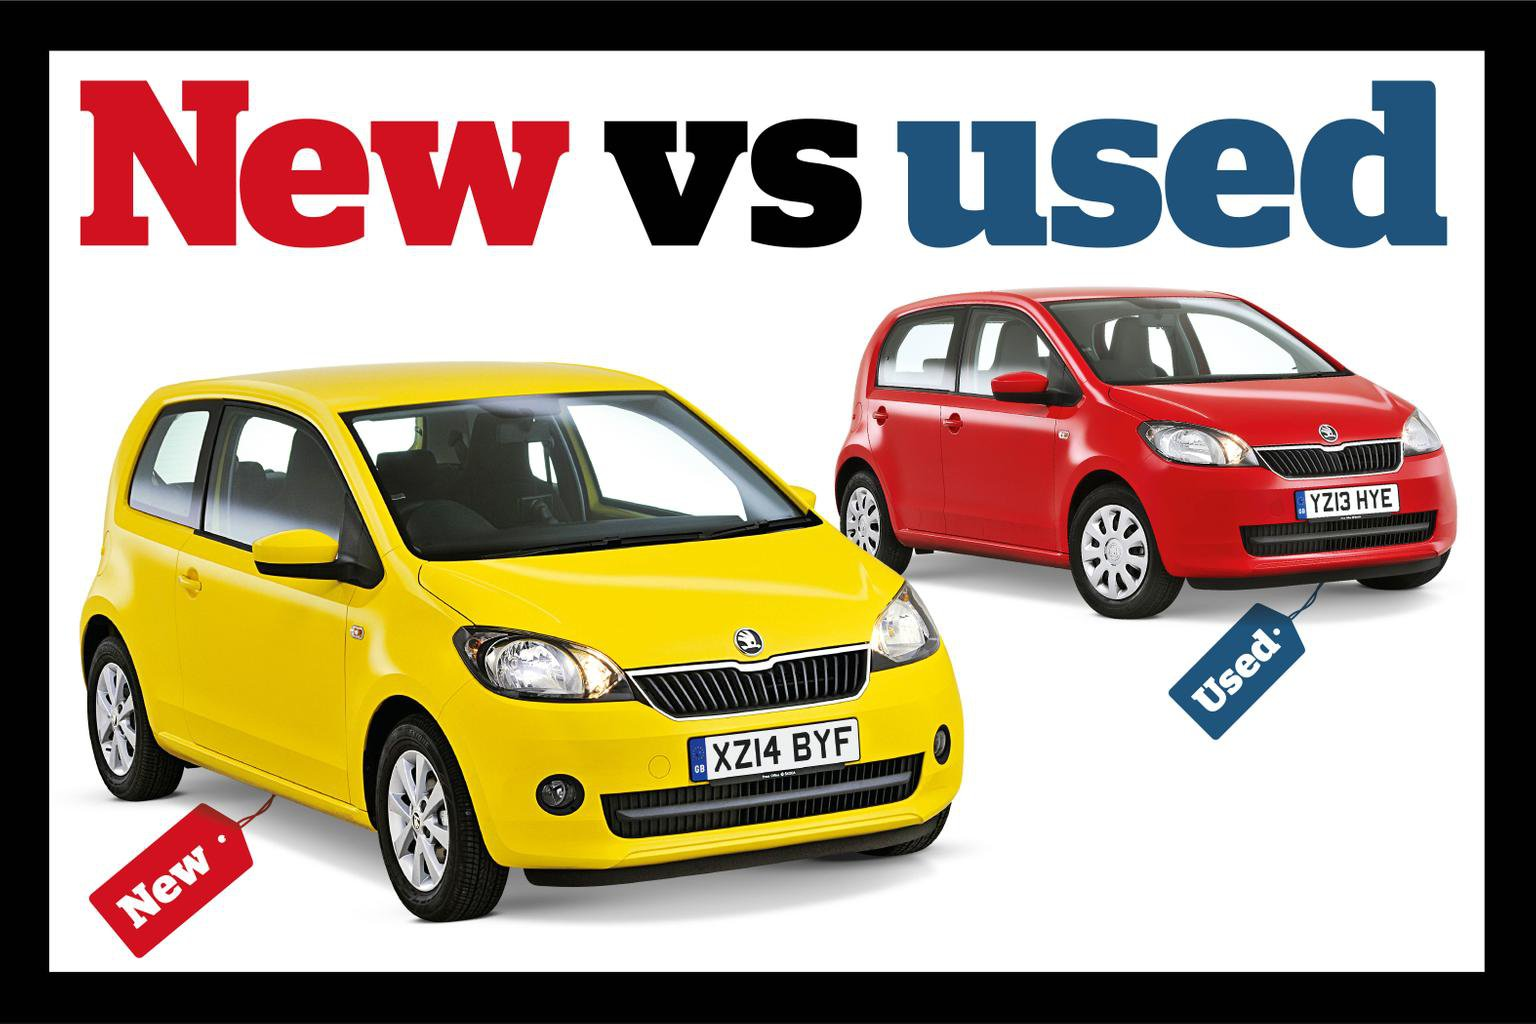 New vs Used